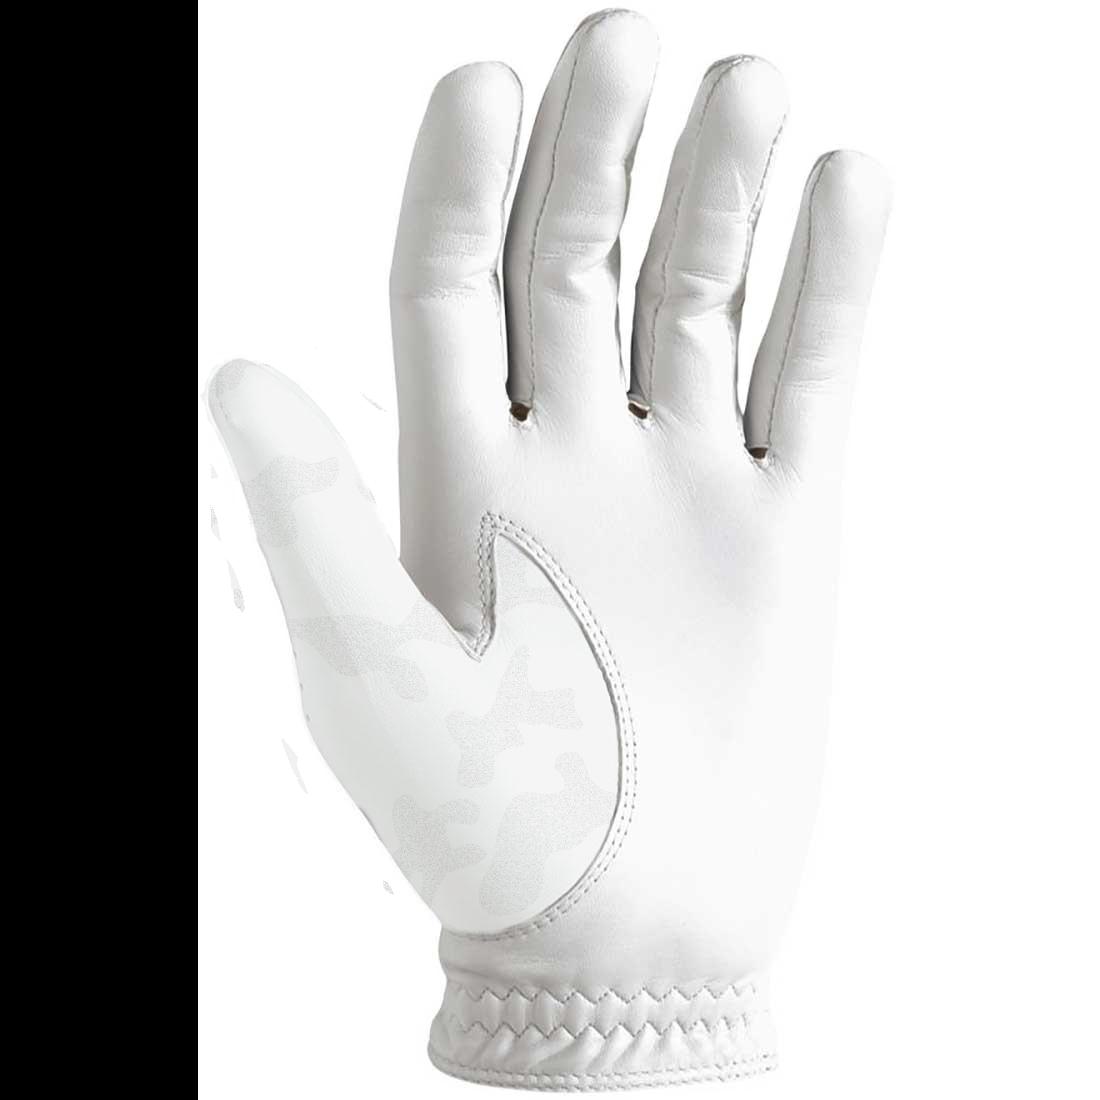 Aiden Ross Camo Golf Glove Image